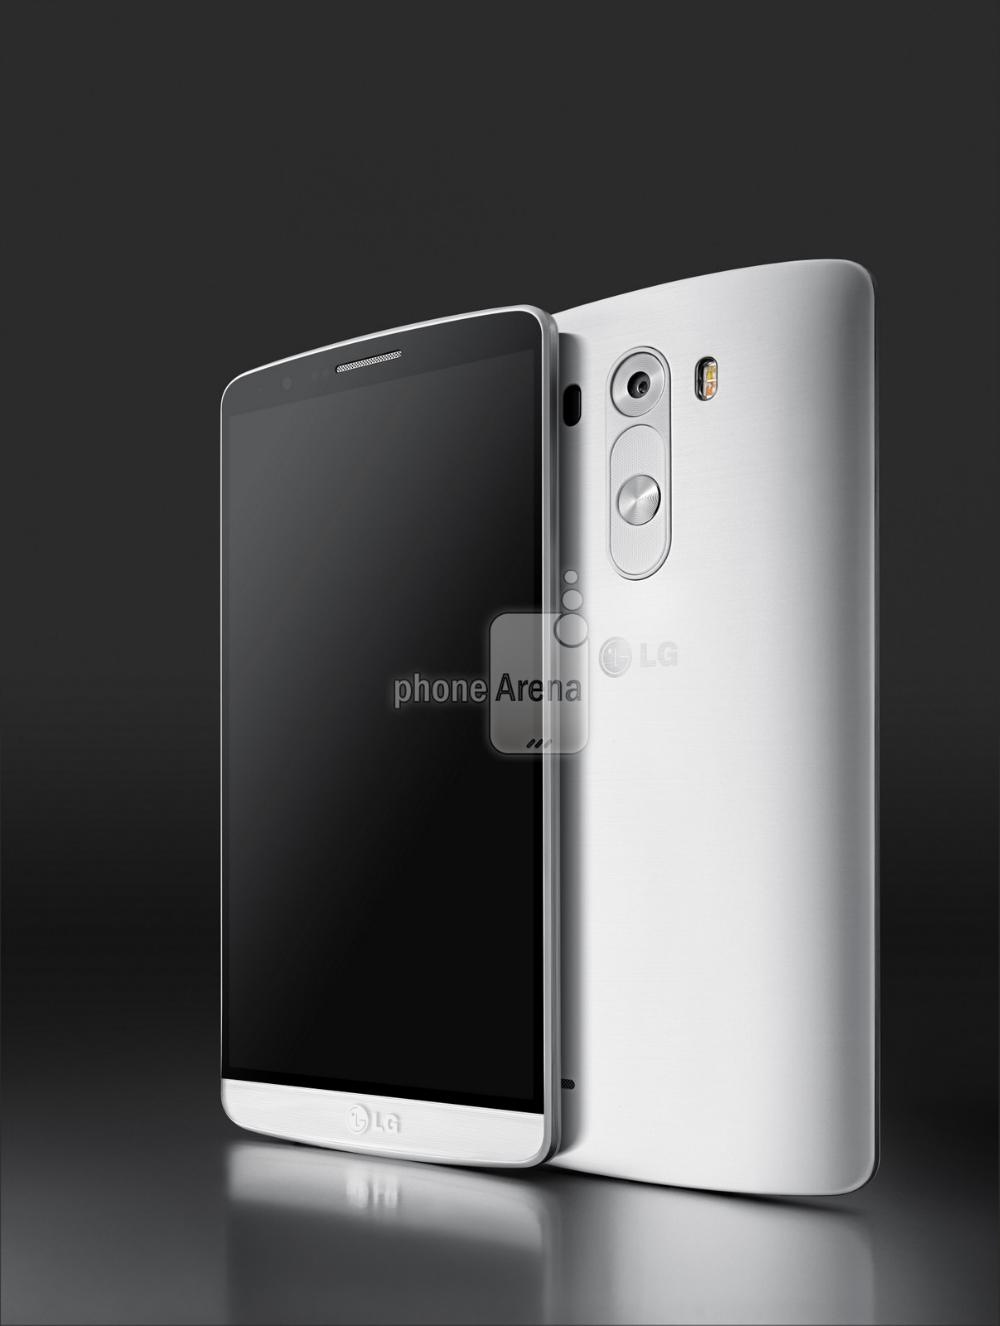 lg-g3-press-render-3